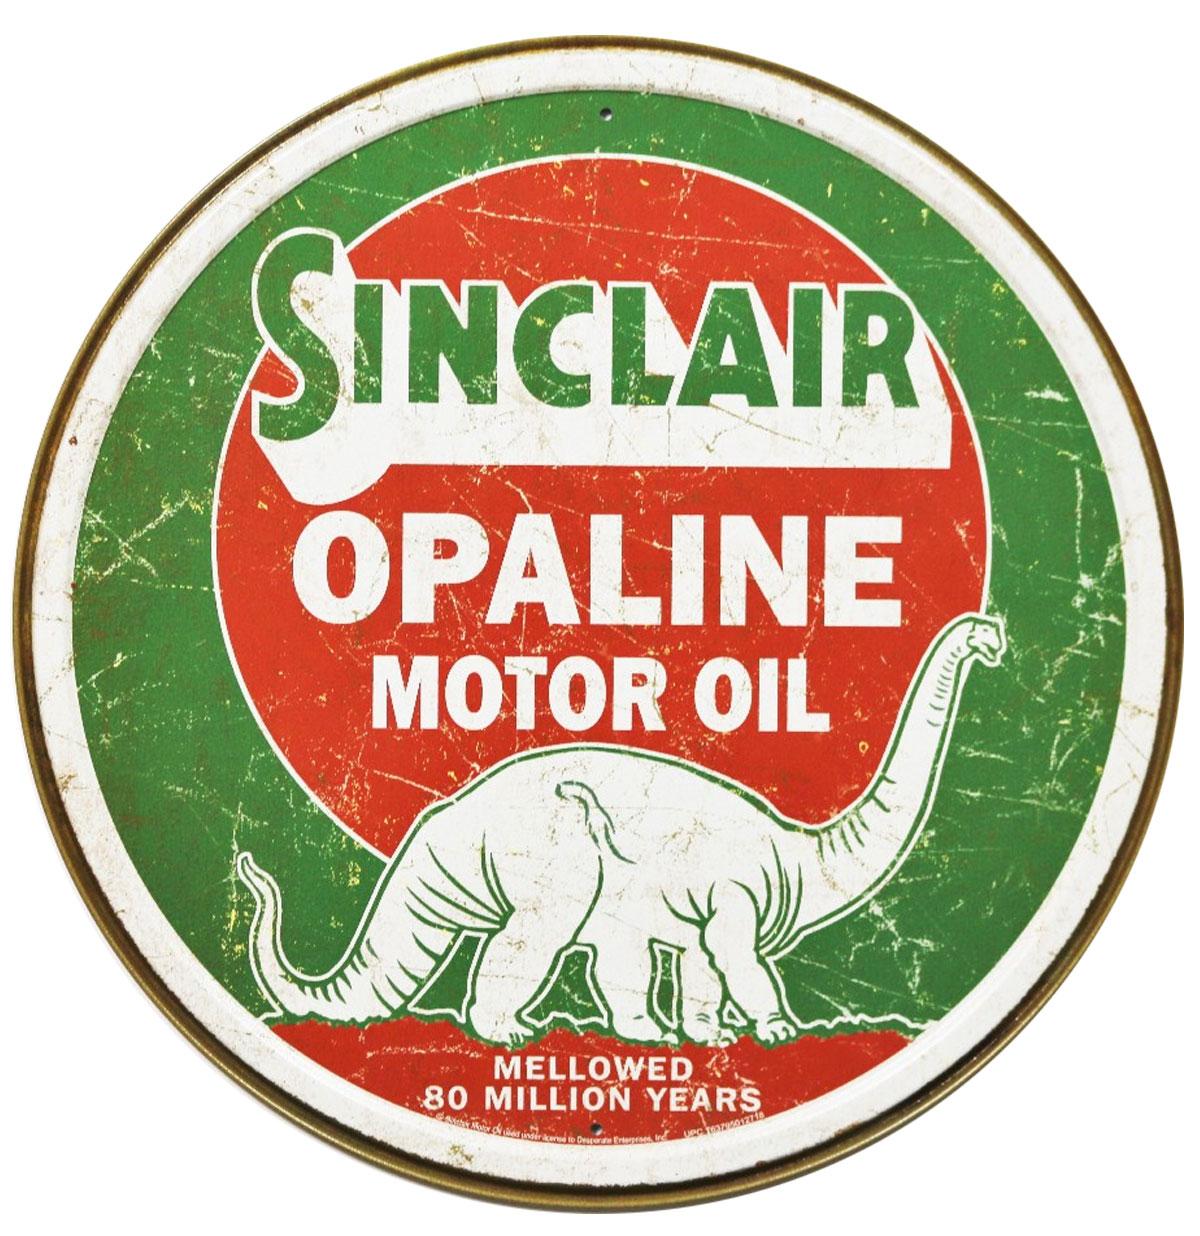 Sinclair Opaline Motor Oil Metalen Poster